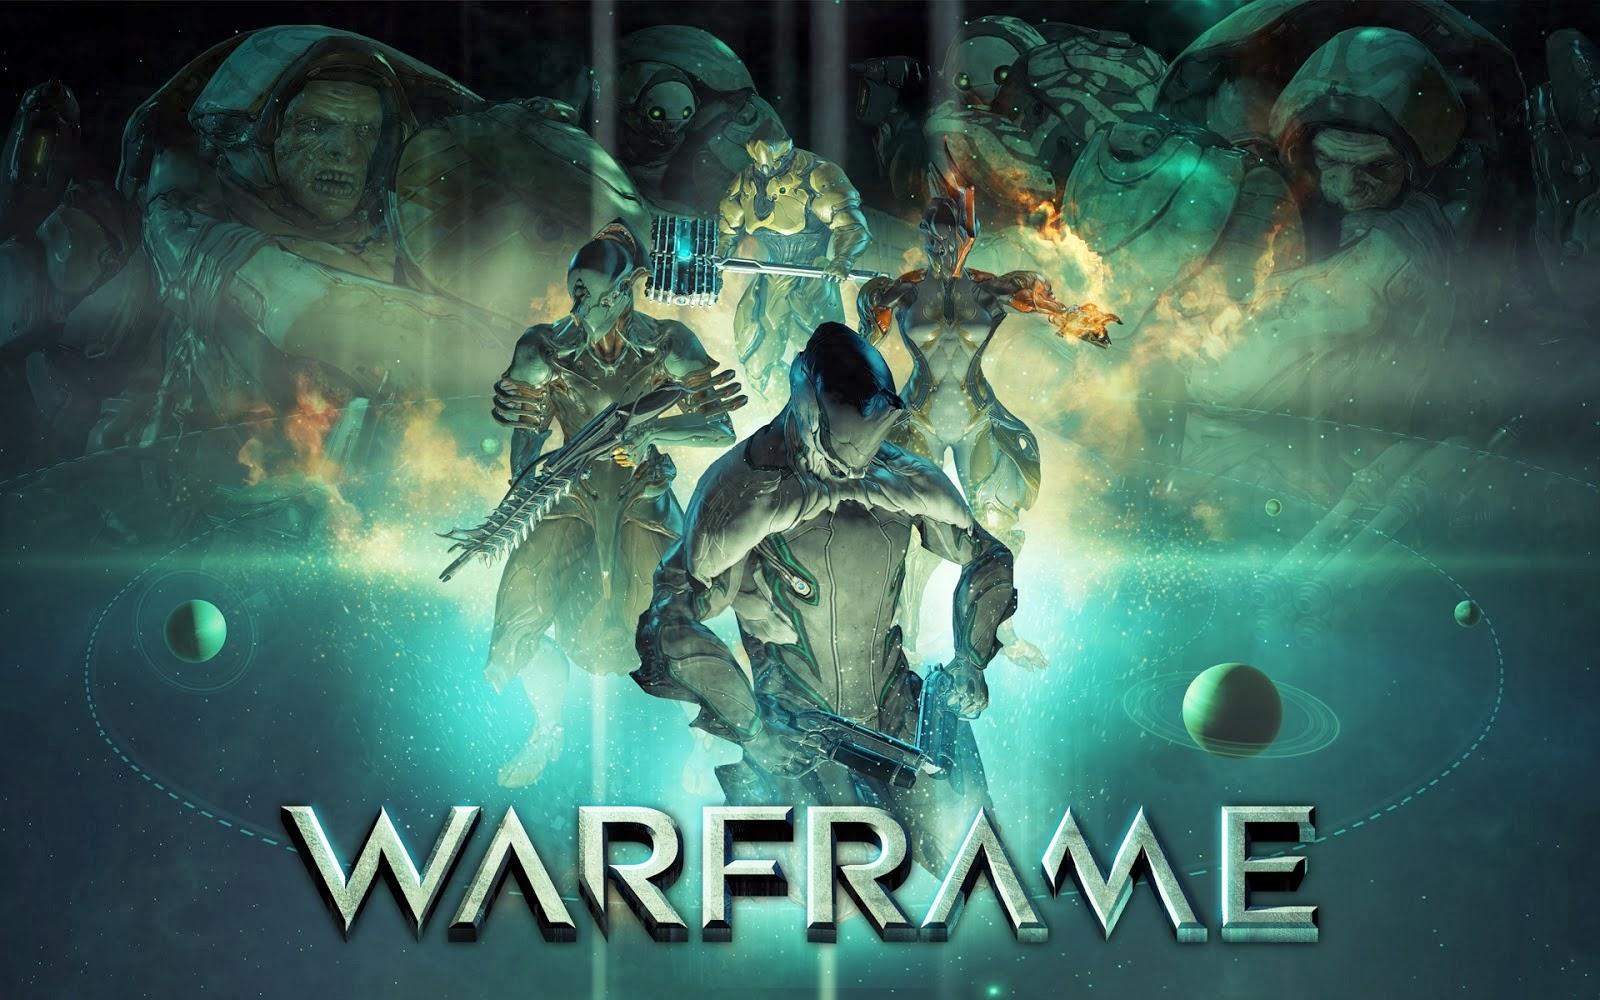 Warframe vamos jogar | Game Videos